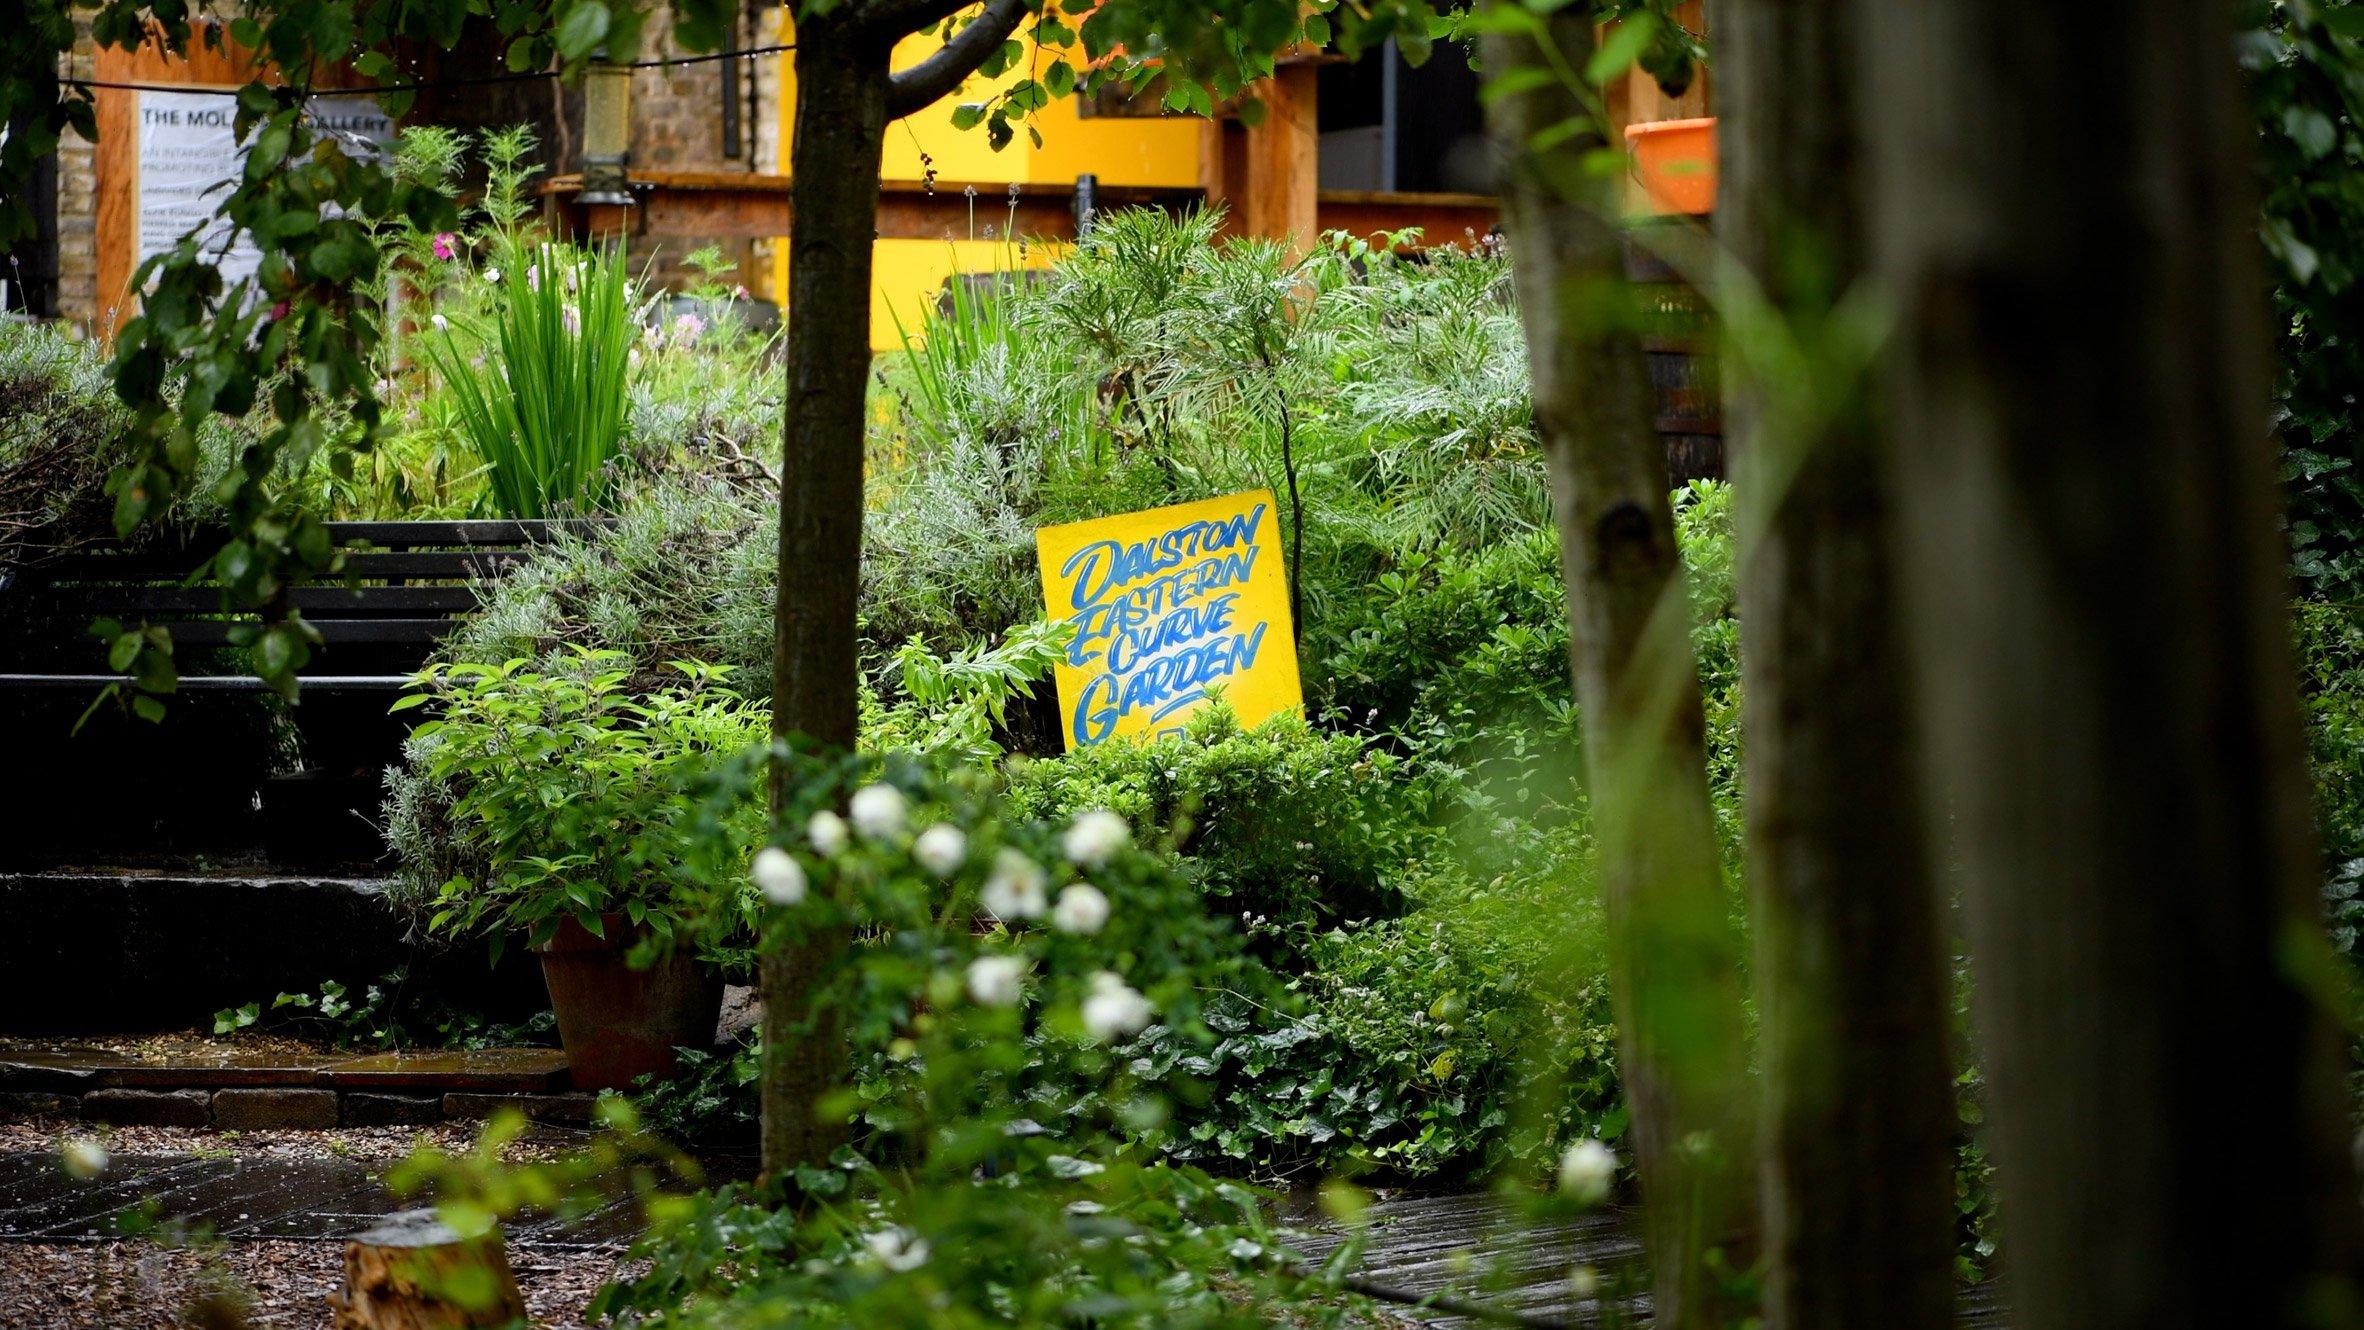 Stills from Open House London's Dalston Curve Garden short film